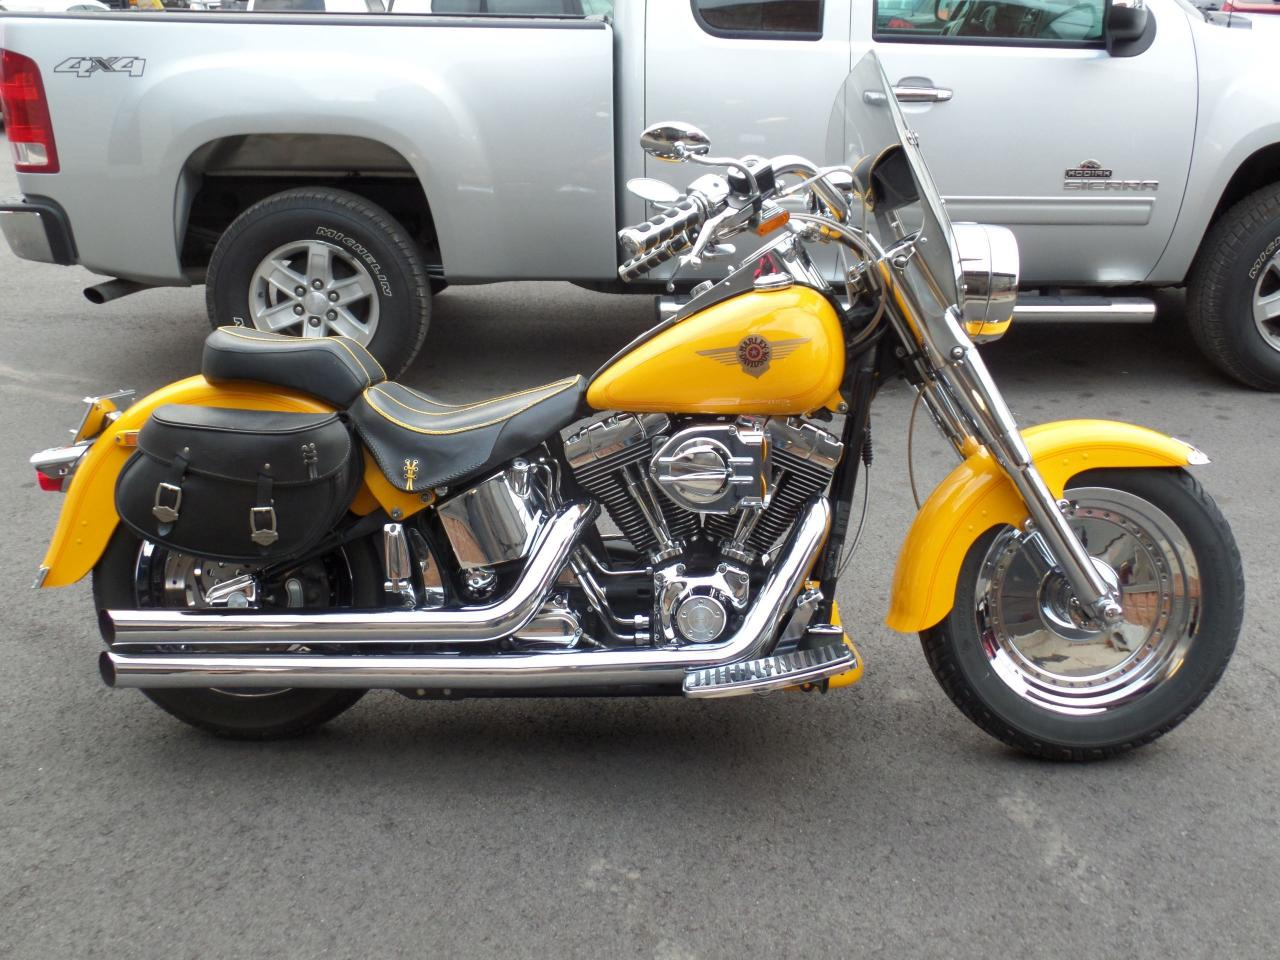 Photo of Yellow 2000 Harley-Davidson FAT BOY